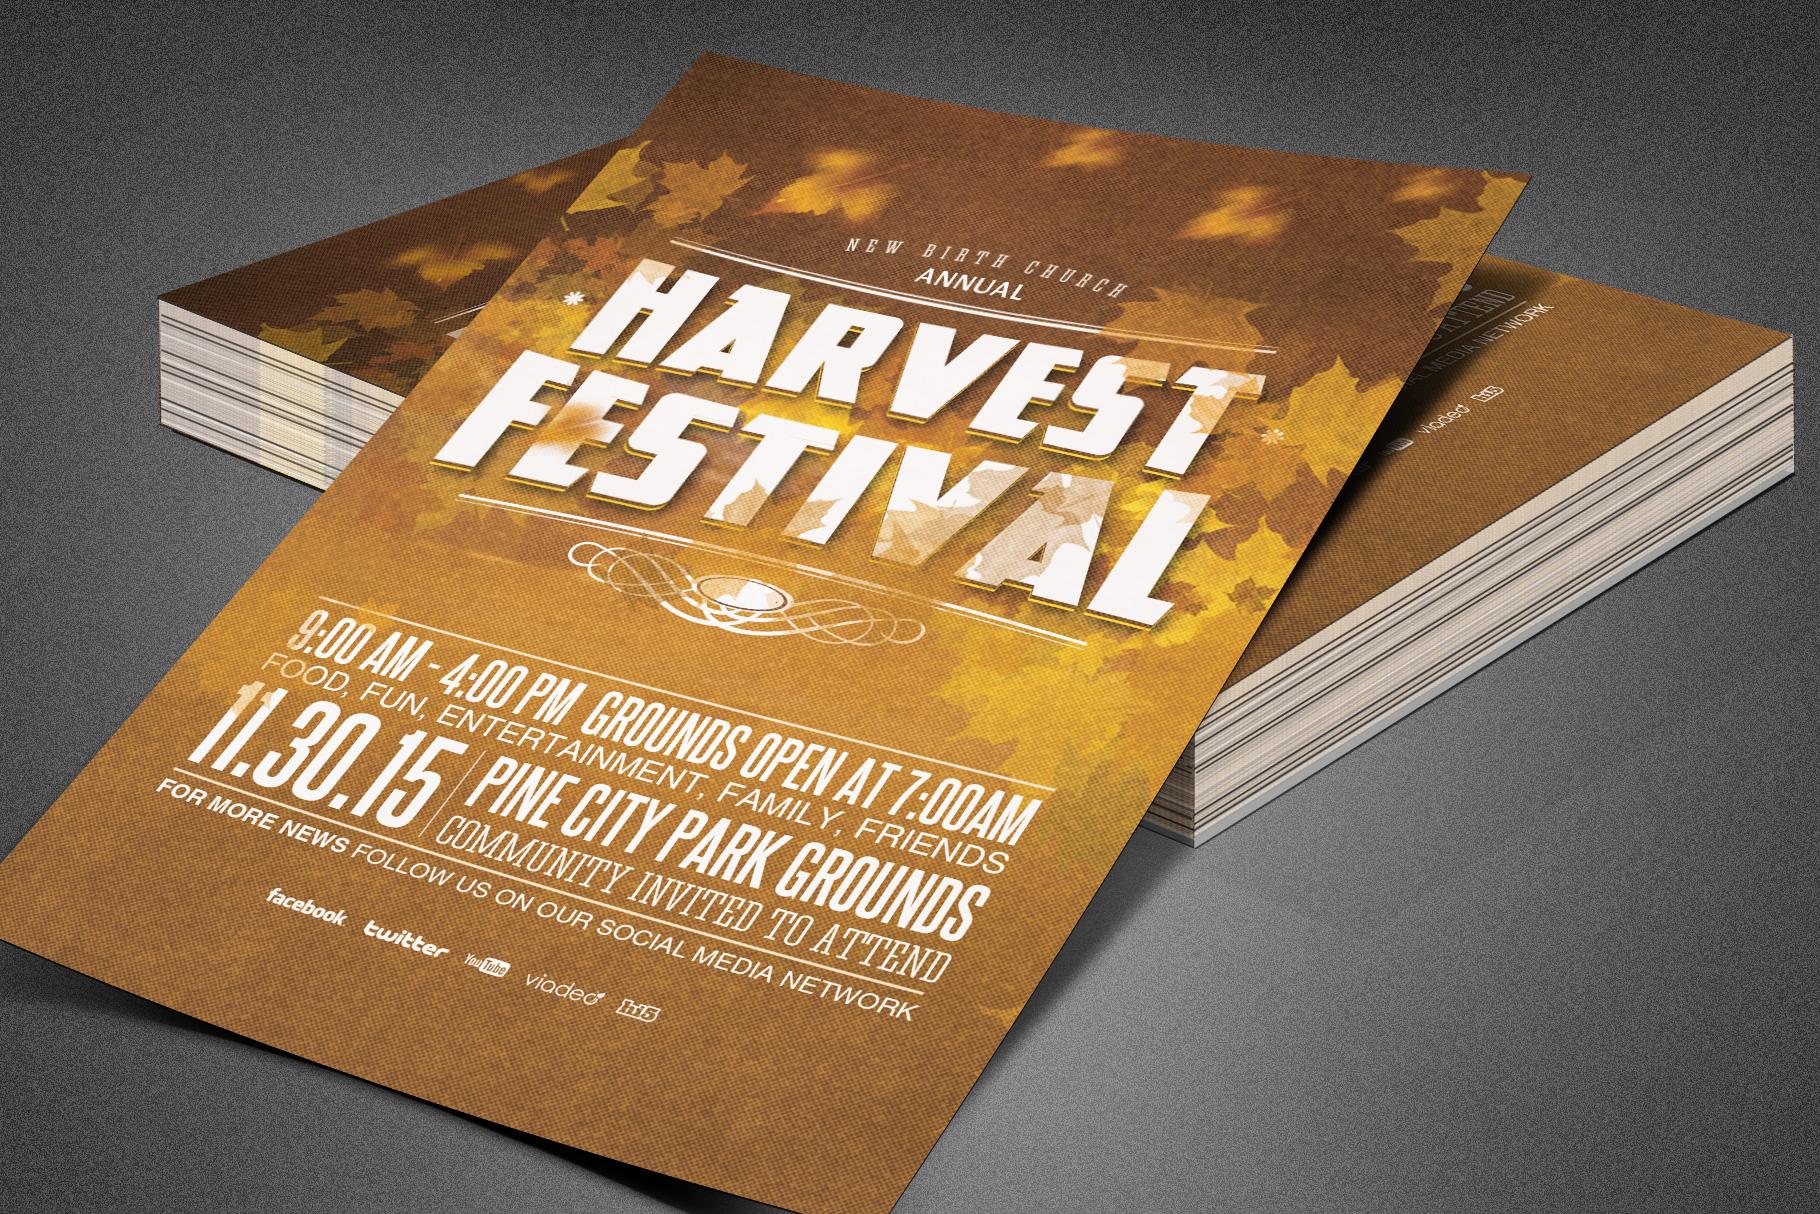 Harvest Festival Church Flyer example image 4